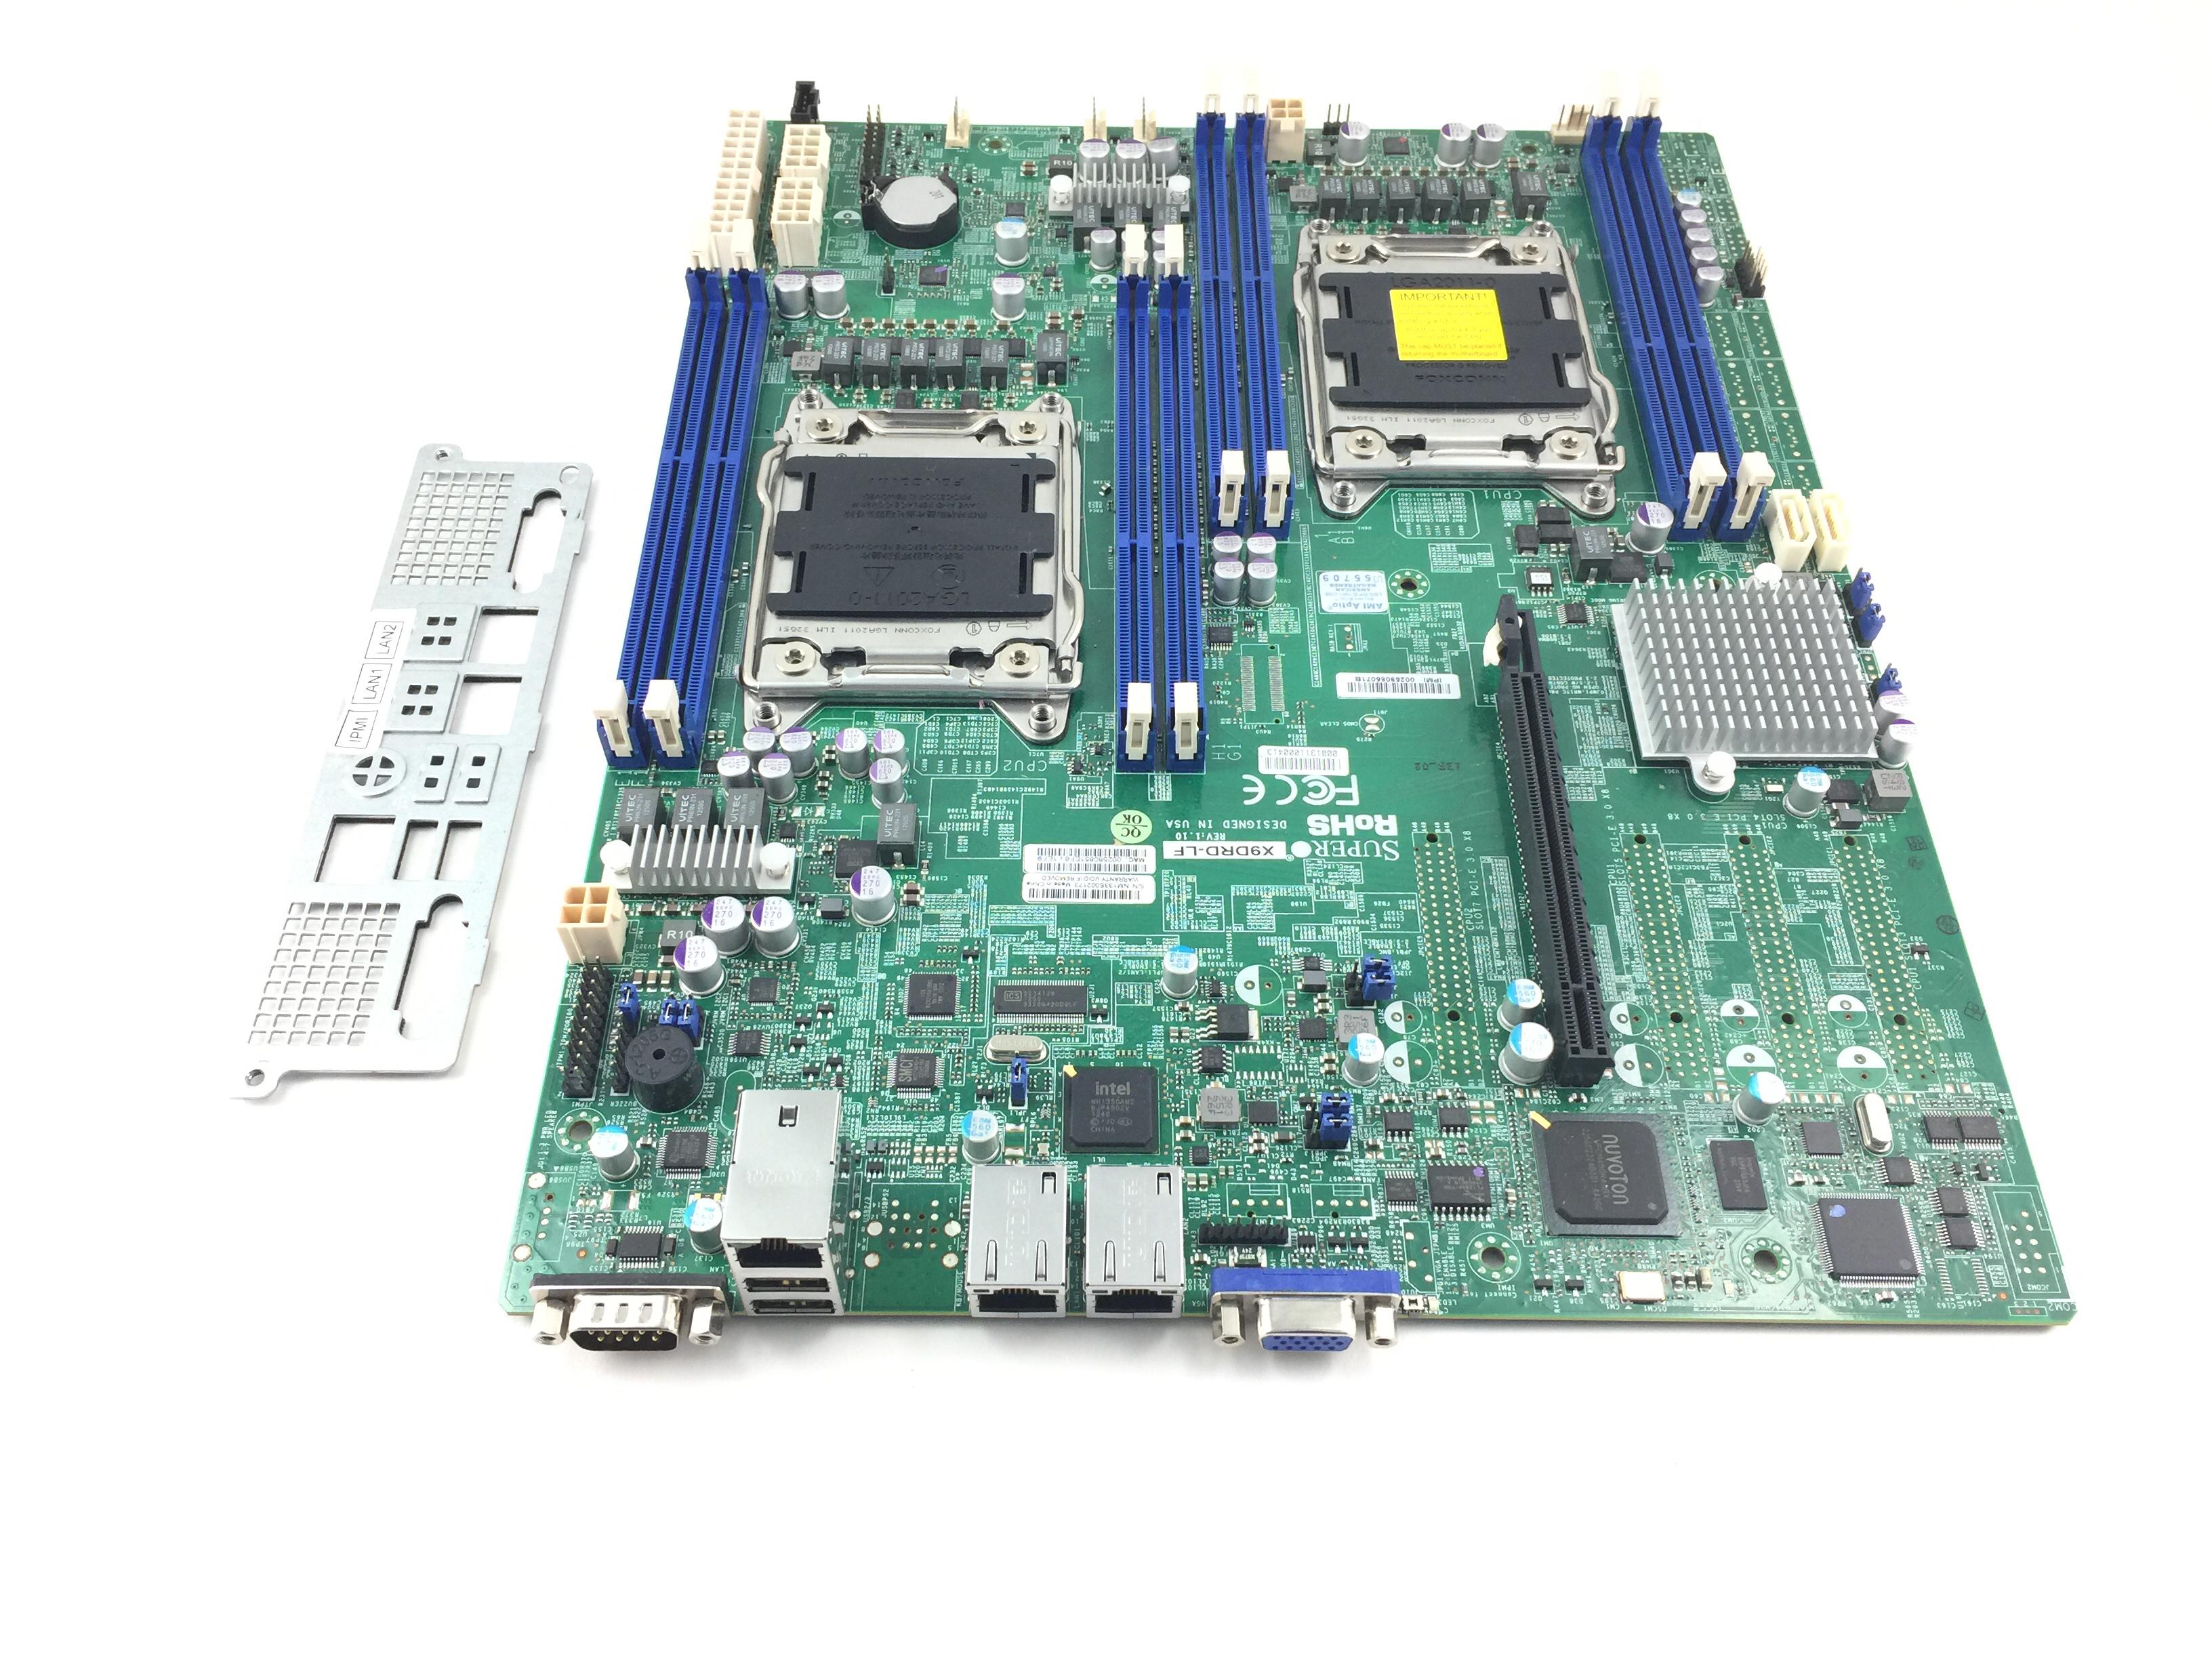 Supermicro Dual Socket LGA 2011 E-Atx Server System Board W/ Io Plate (X9DRD-LF)